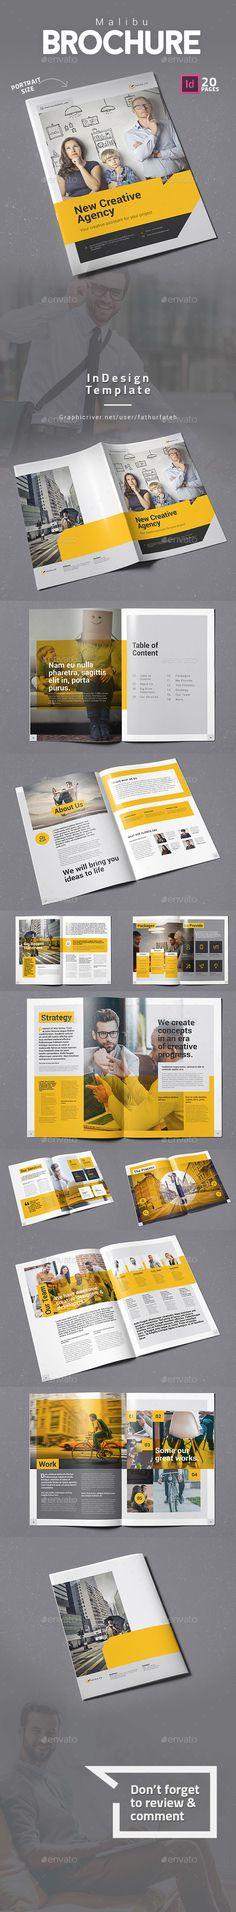 Malibu #Brochure - #Corporate Brochures Download here:  https://graphicriver.net/item/malibu-brochure/20370462?ref=alena994